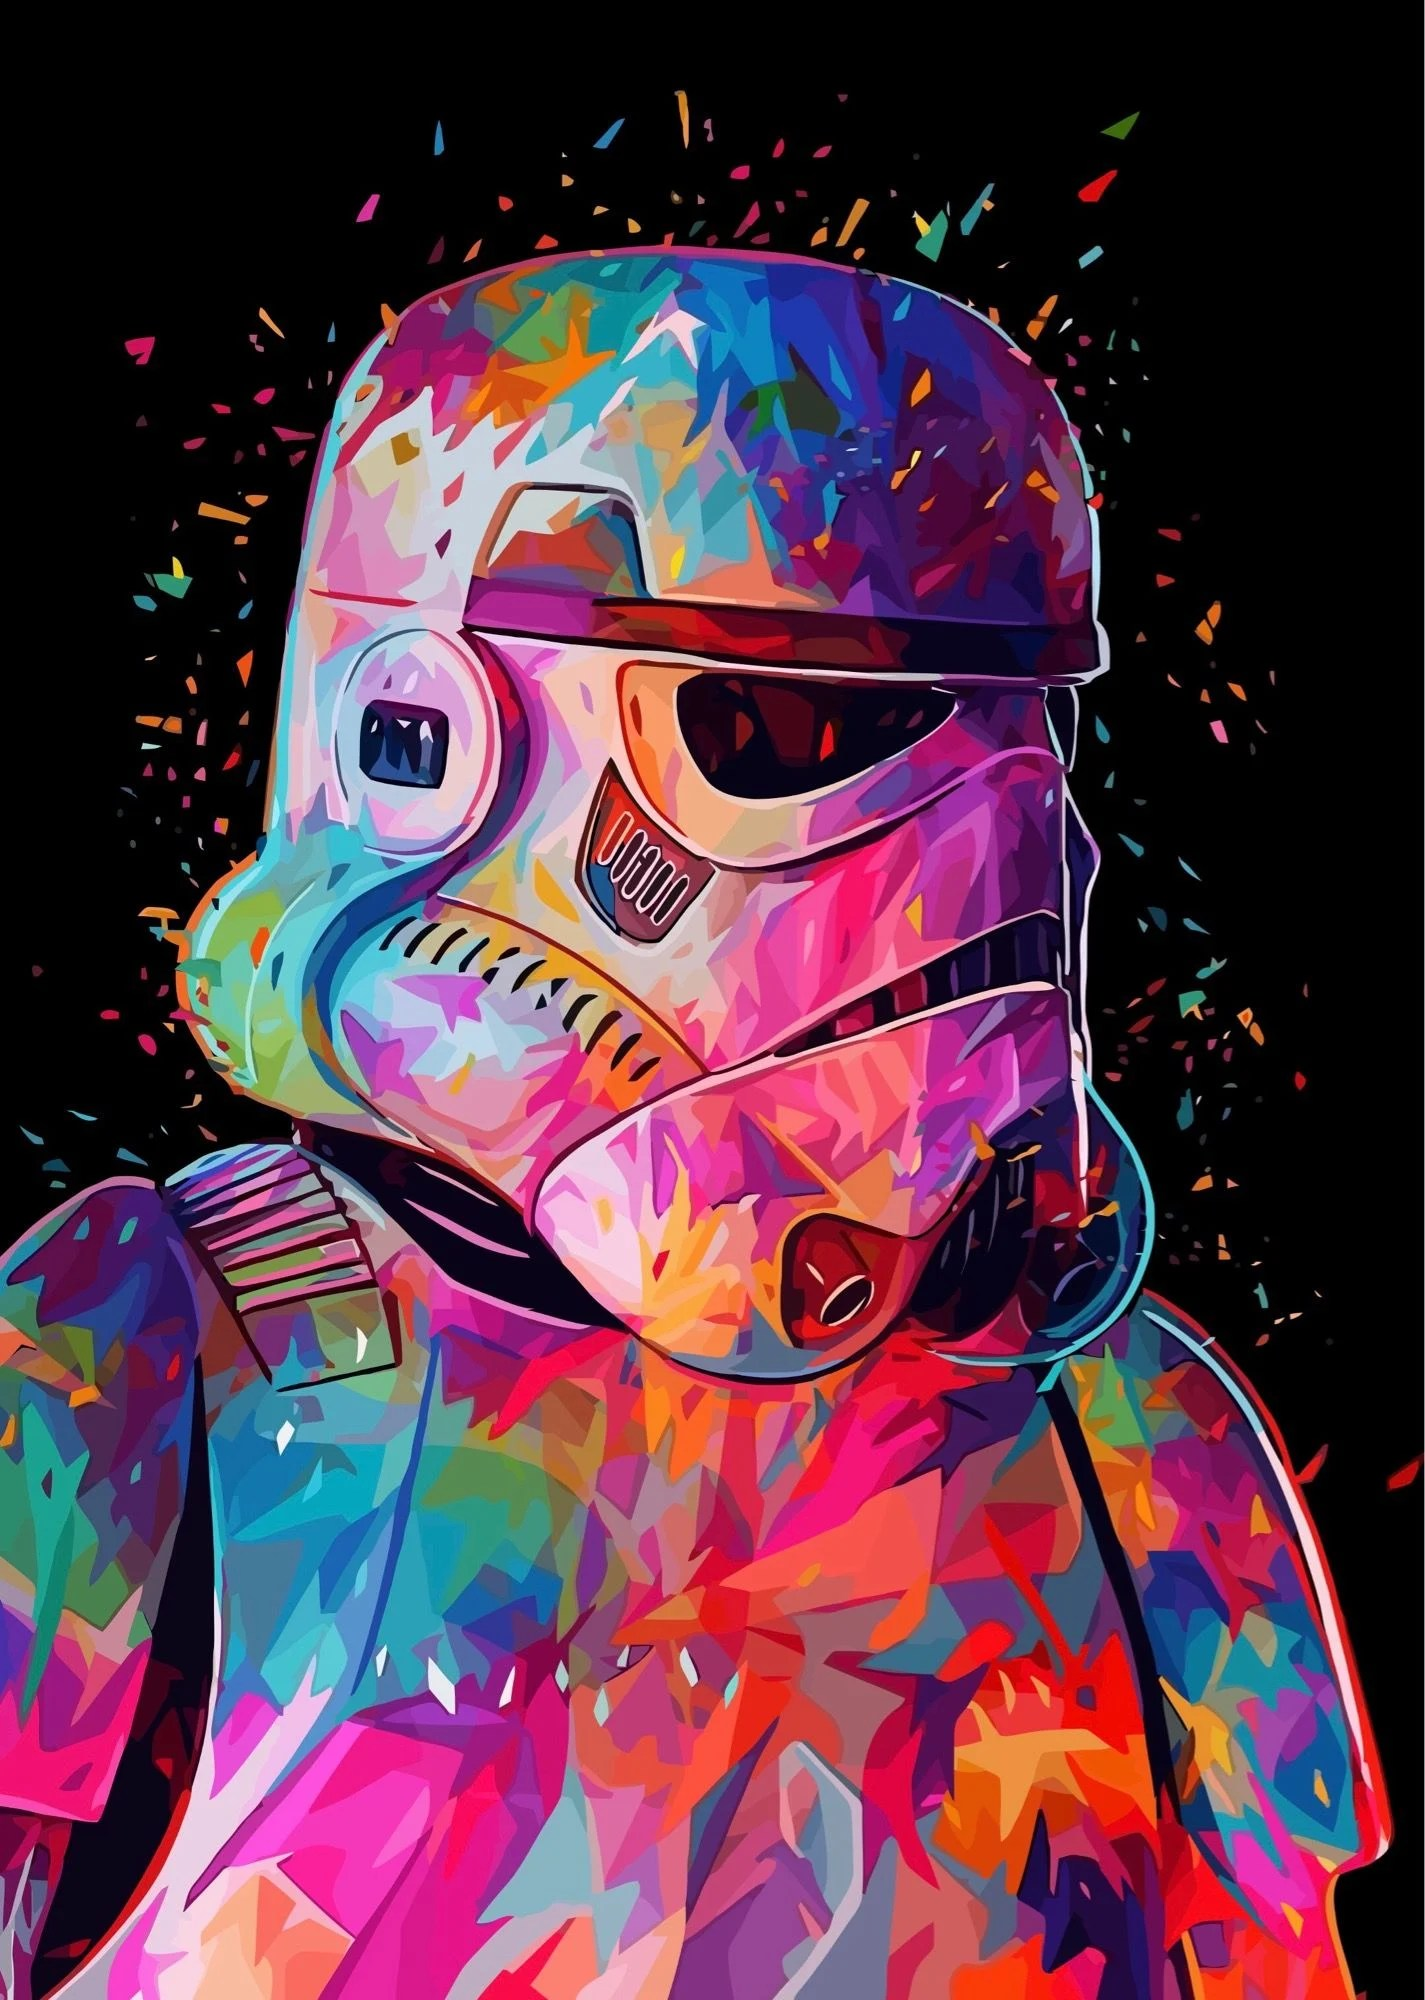 Star Wars Wallpaper Iphone 12